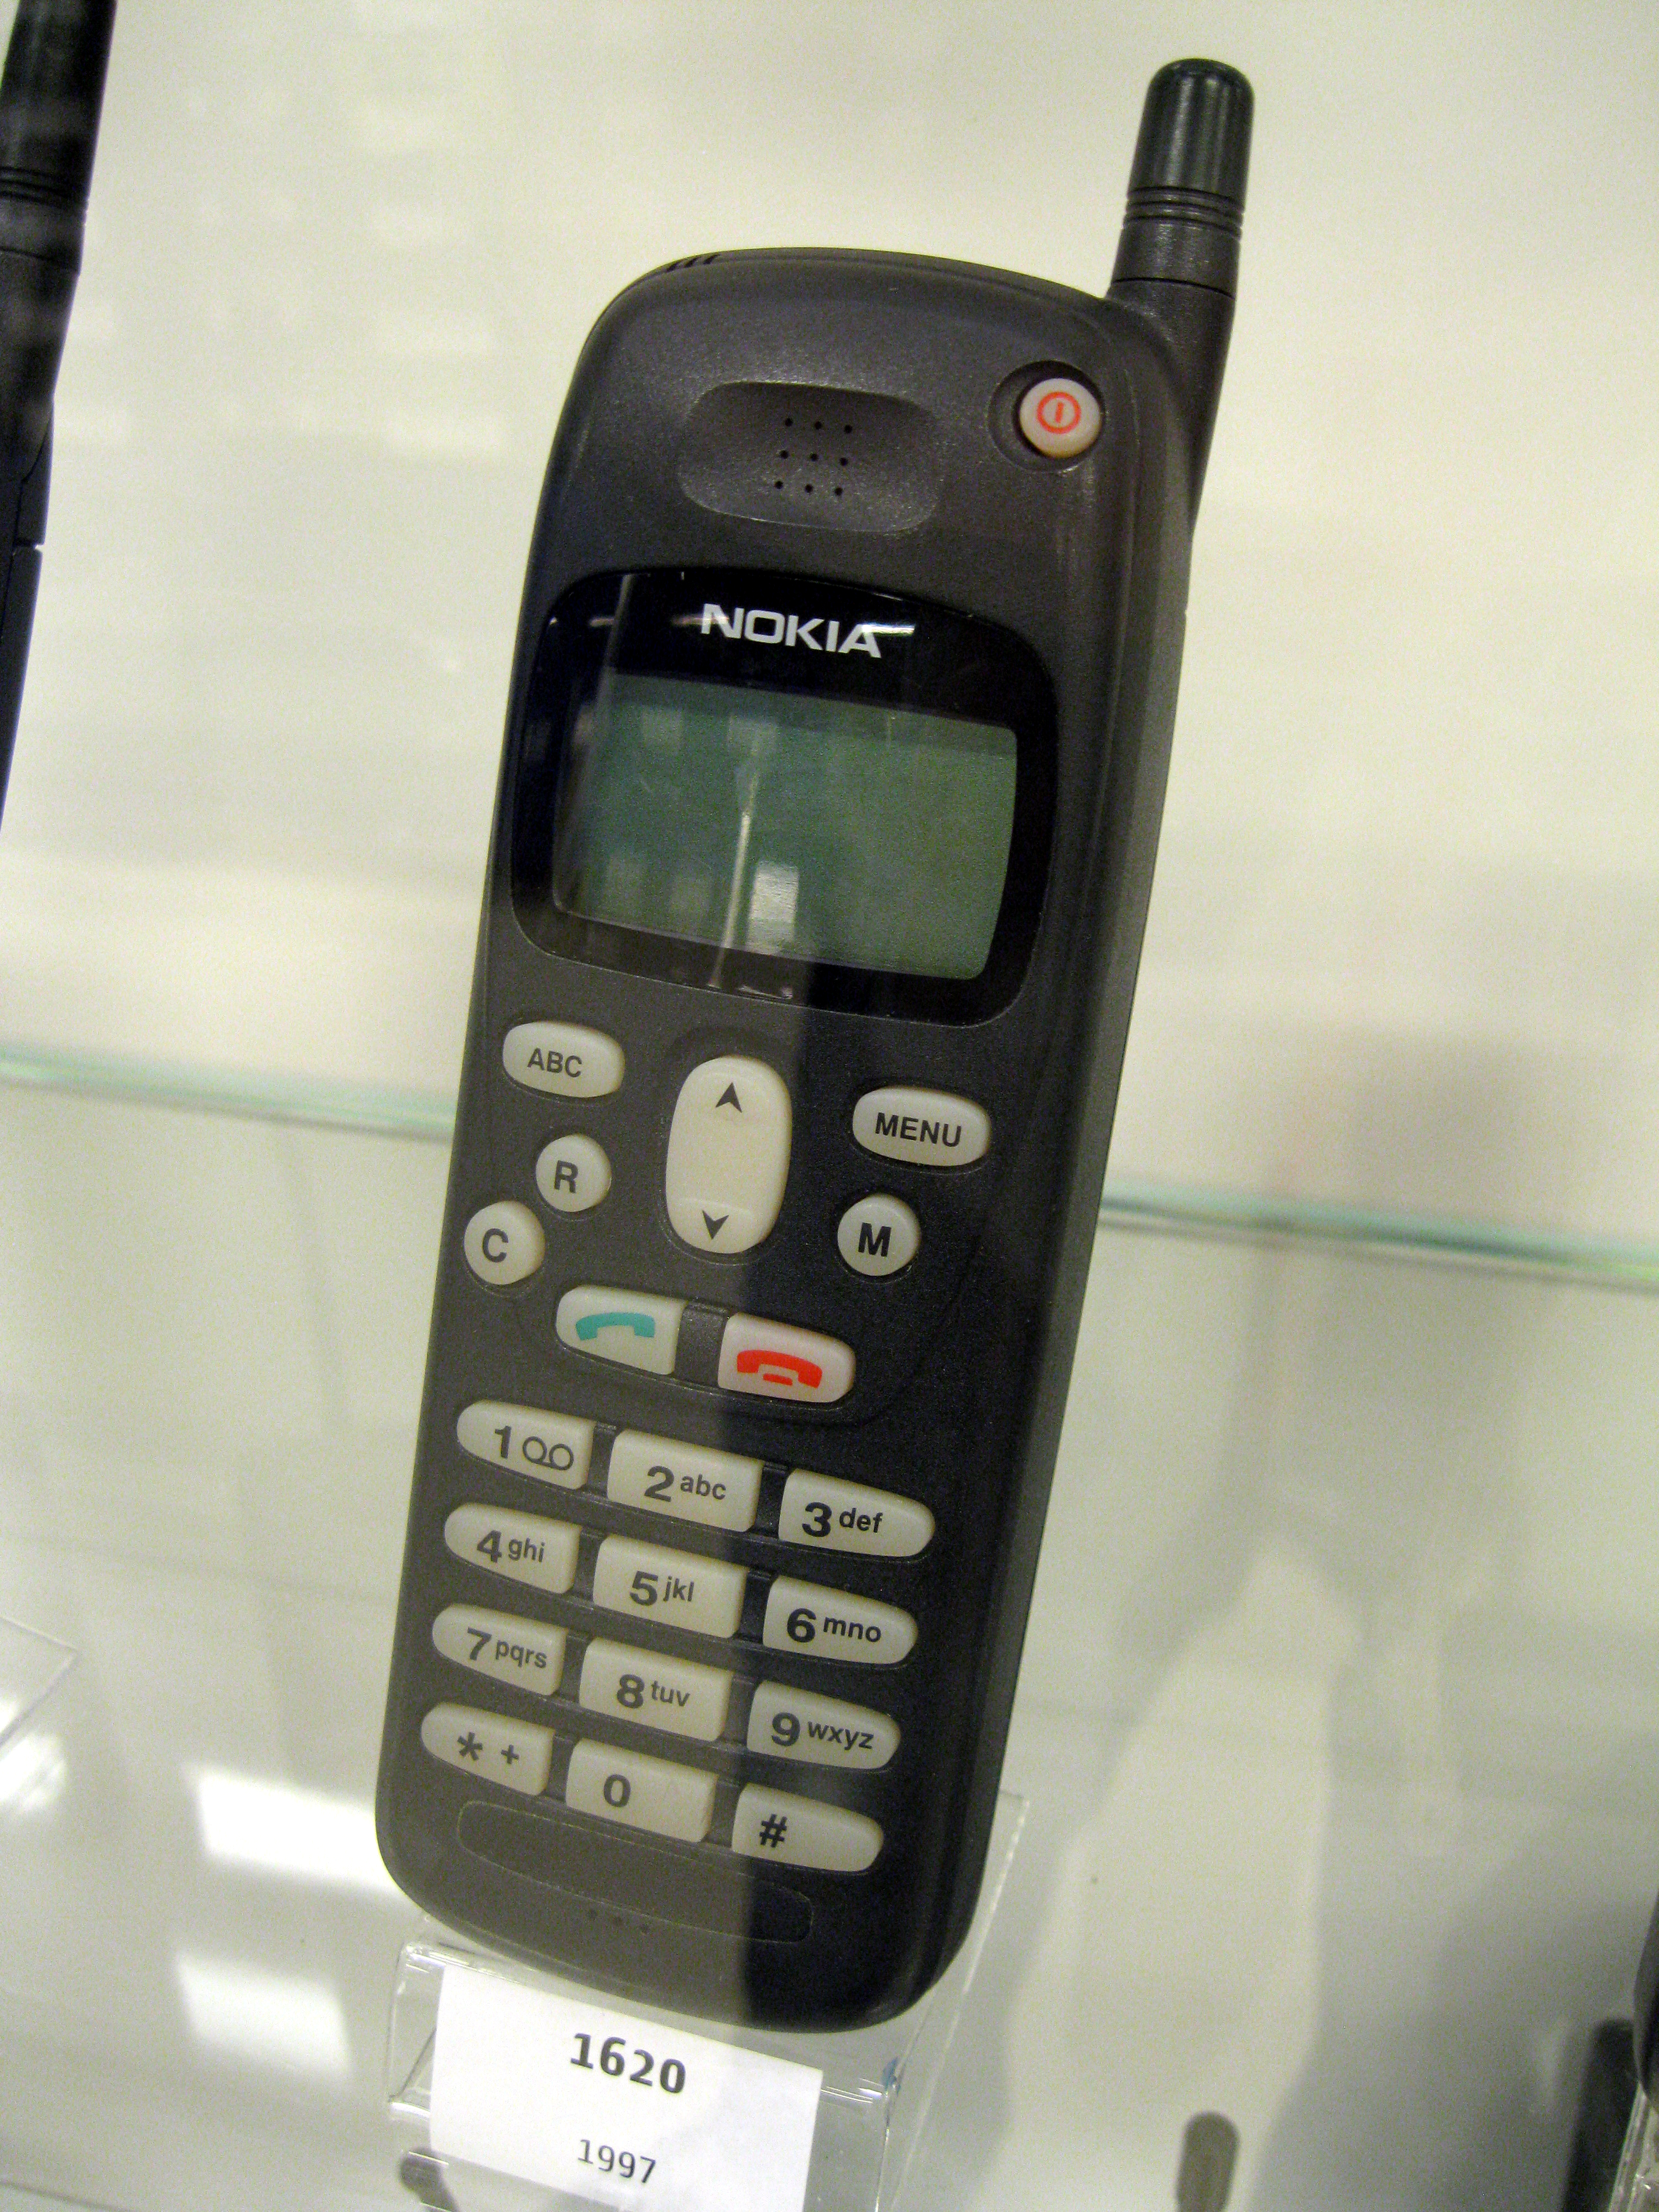 File:Nokia 1620.jpg